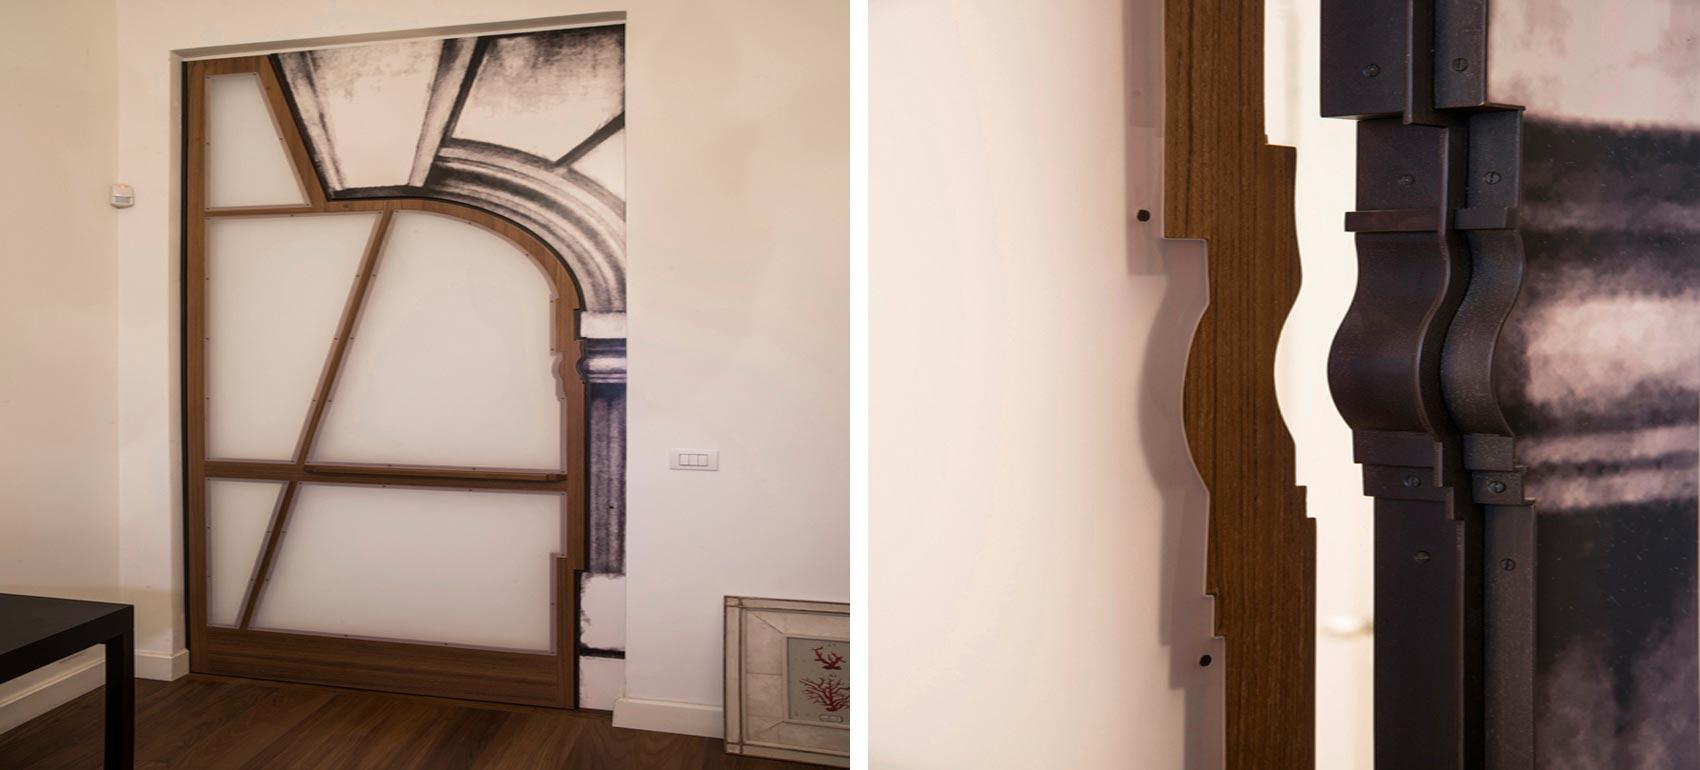 stefanoturi-architetto_residenzaprivata2_11